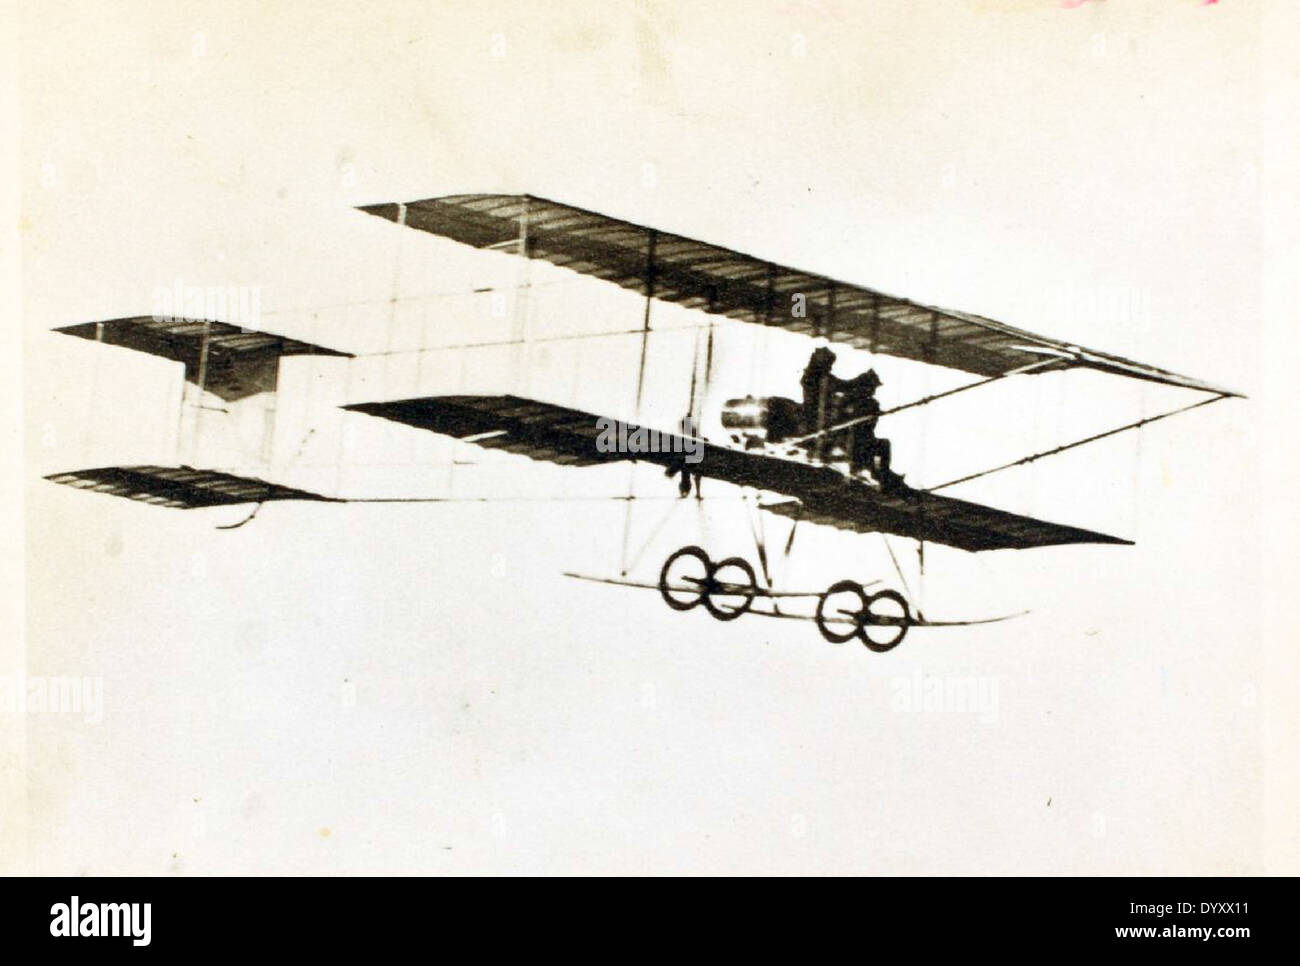 Farman AircraftStockfotos & Bilder